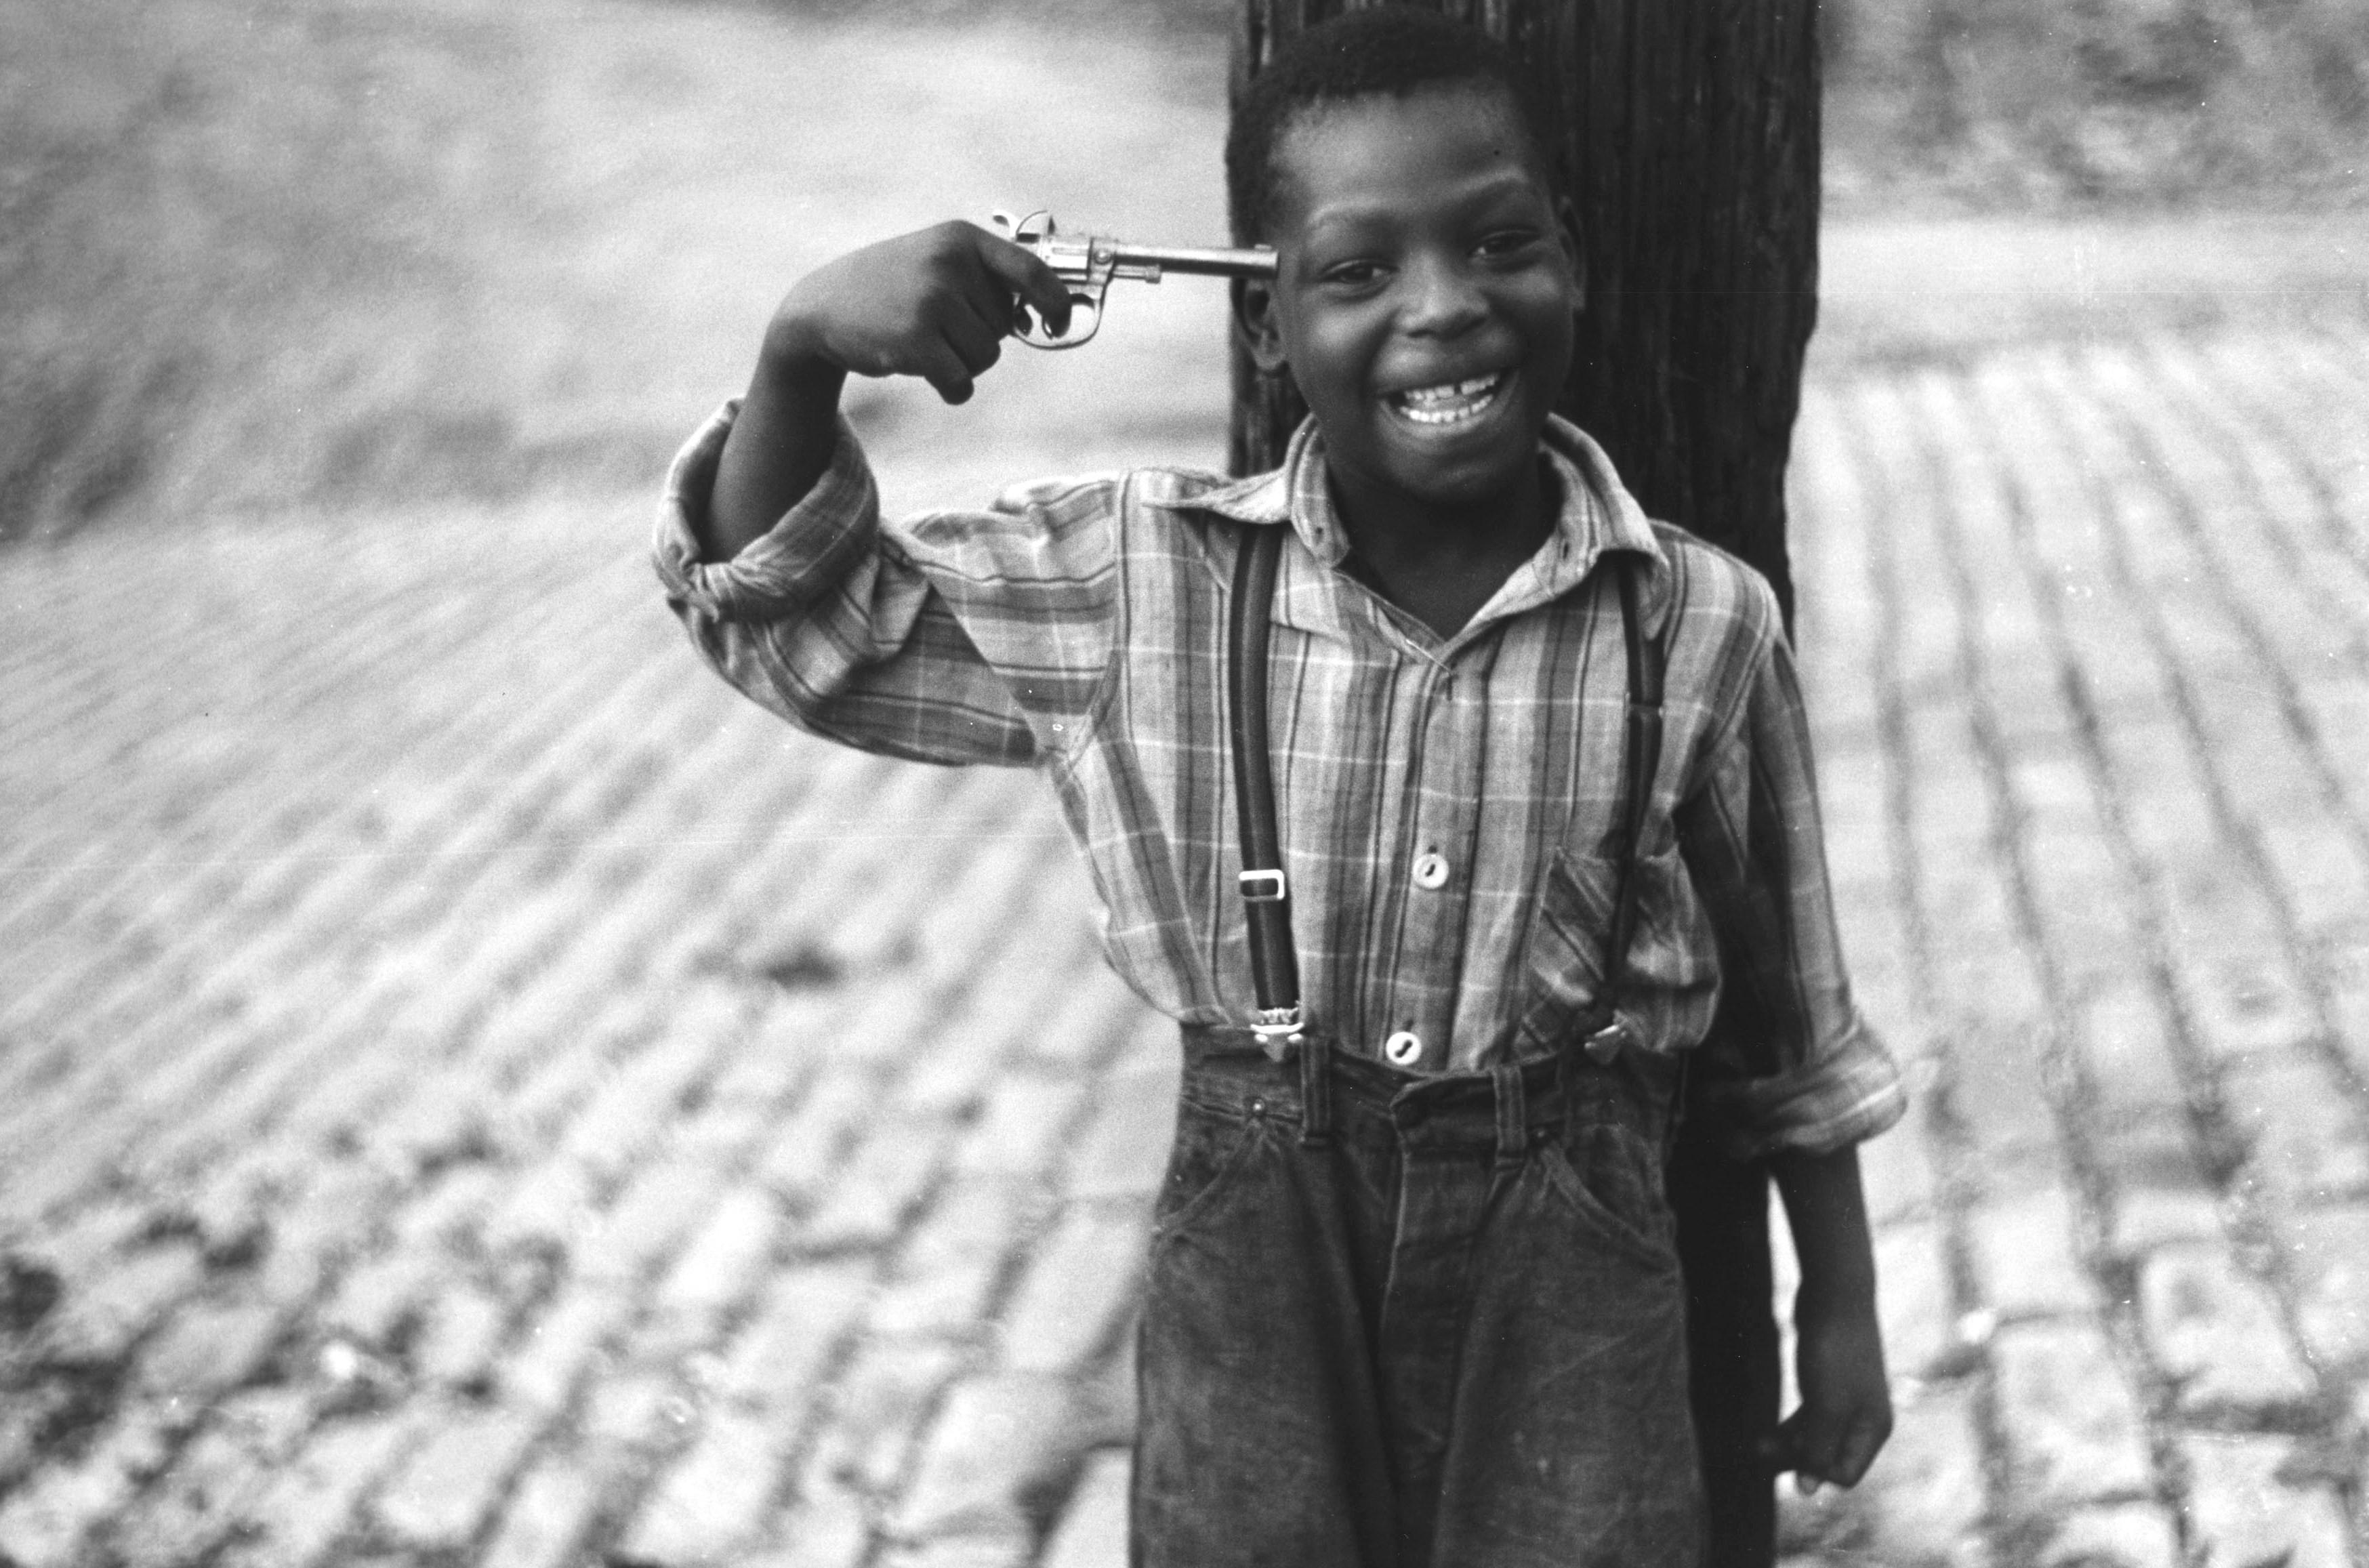 This Week's Photo — Boy with Pistol — Elliot Erwitt | by Arshdeep Matharu |  Medium